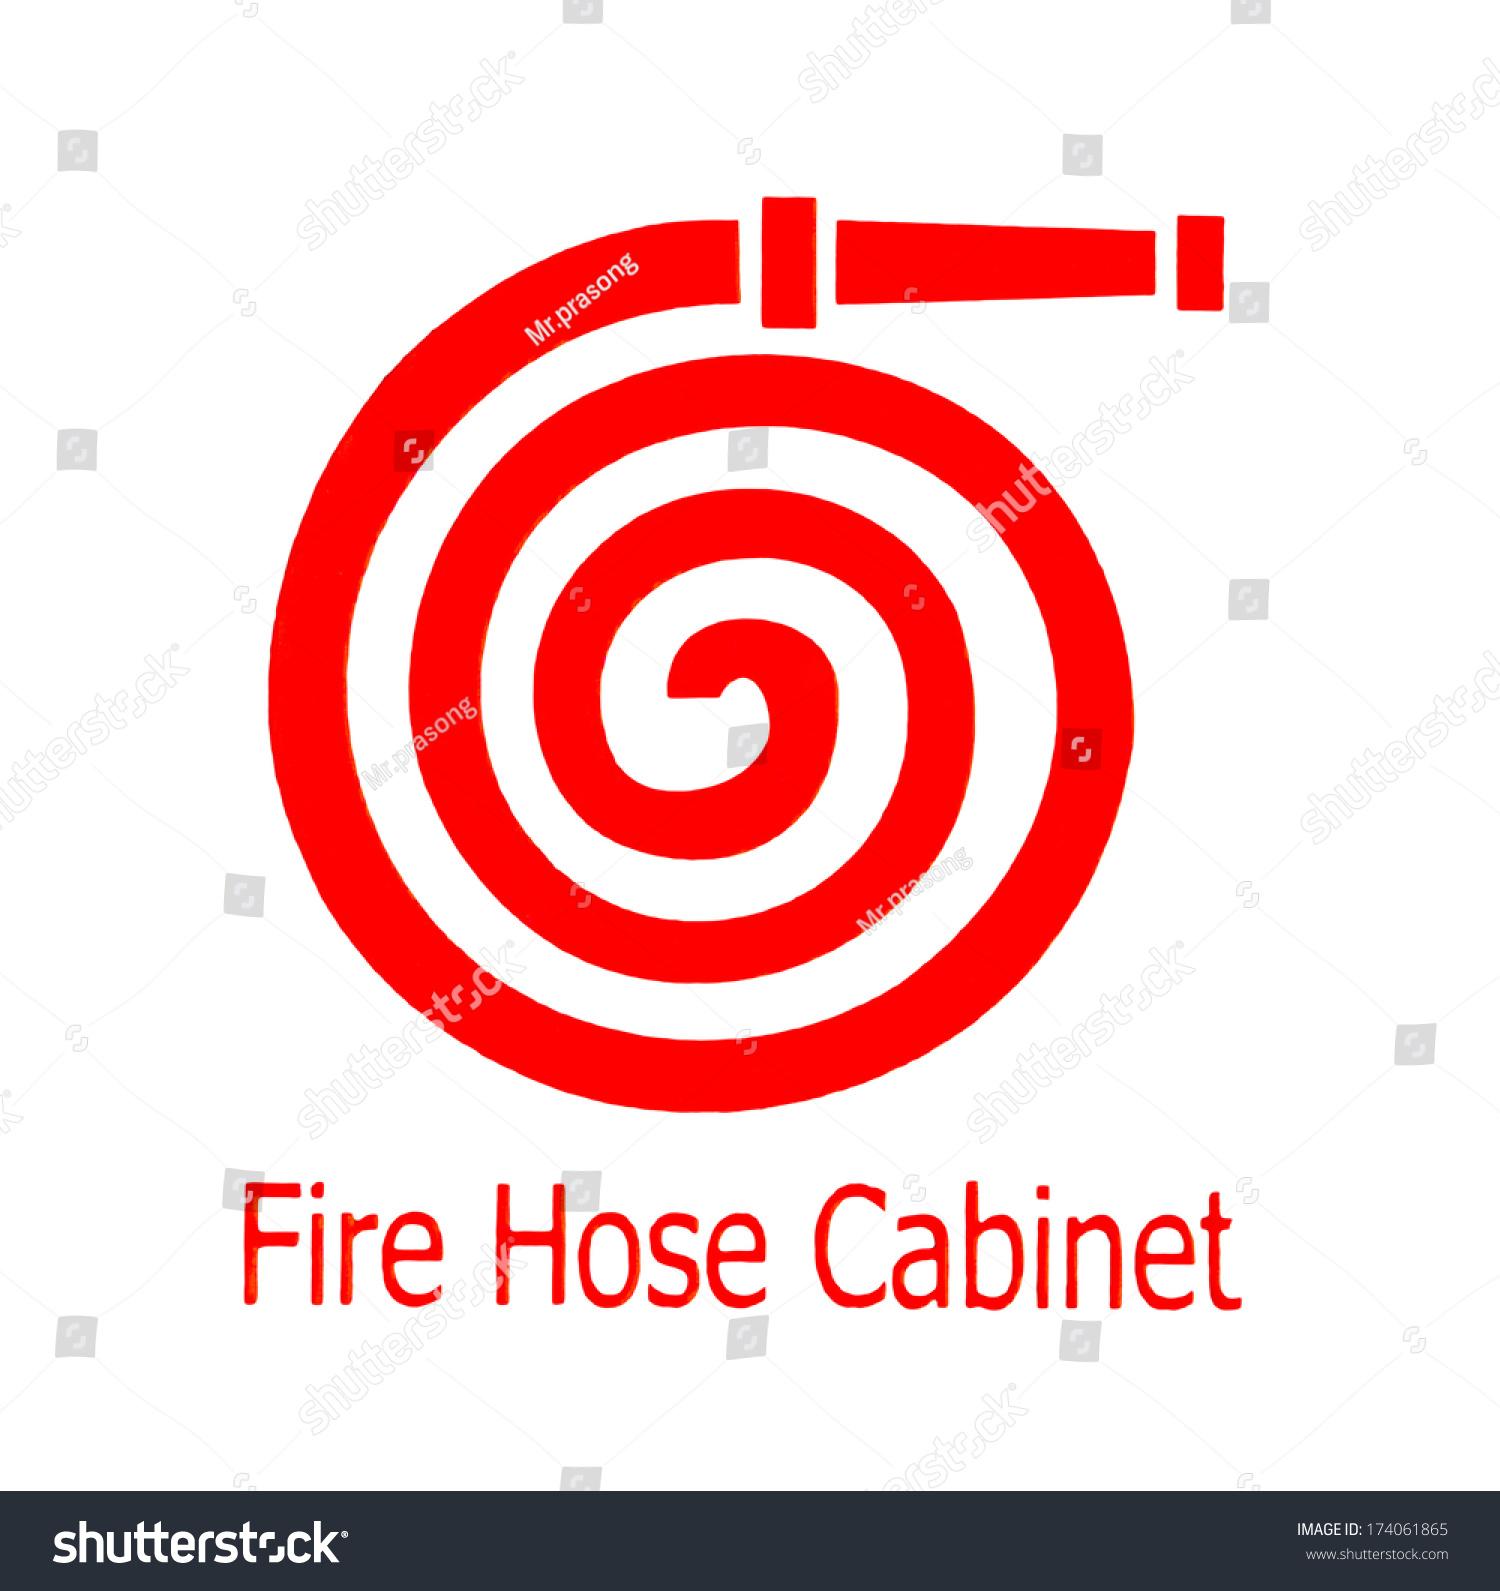 Fire Hose Symbol Stock Illustration 174061865 - Shutterstock